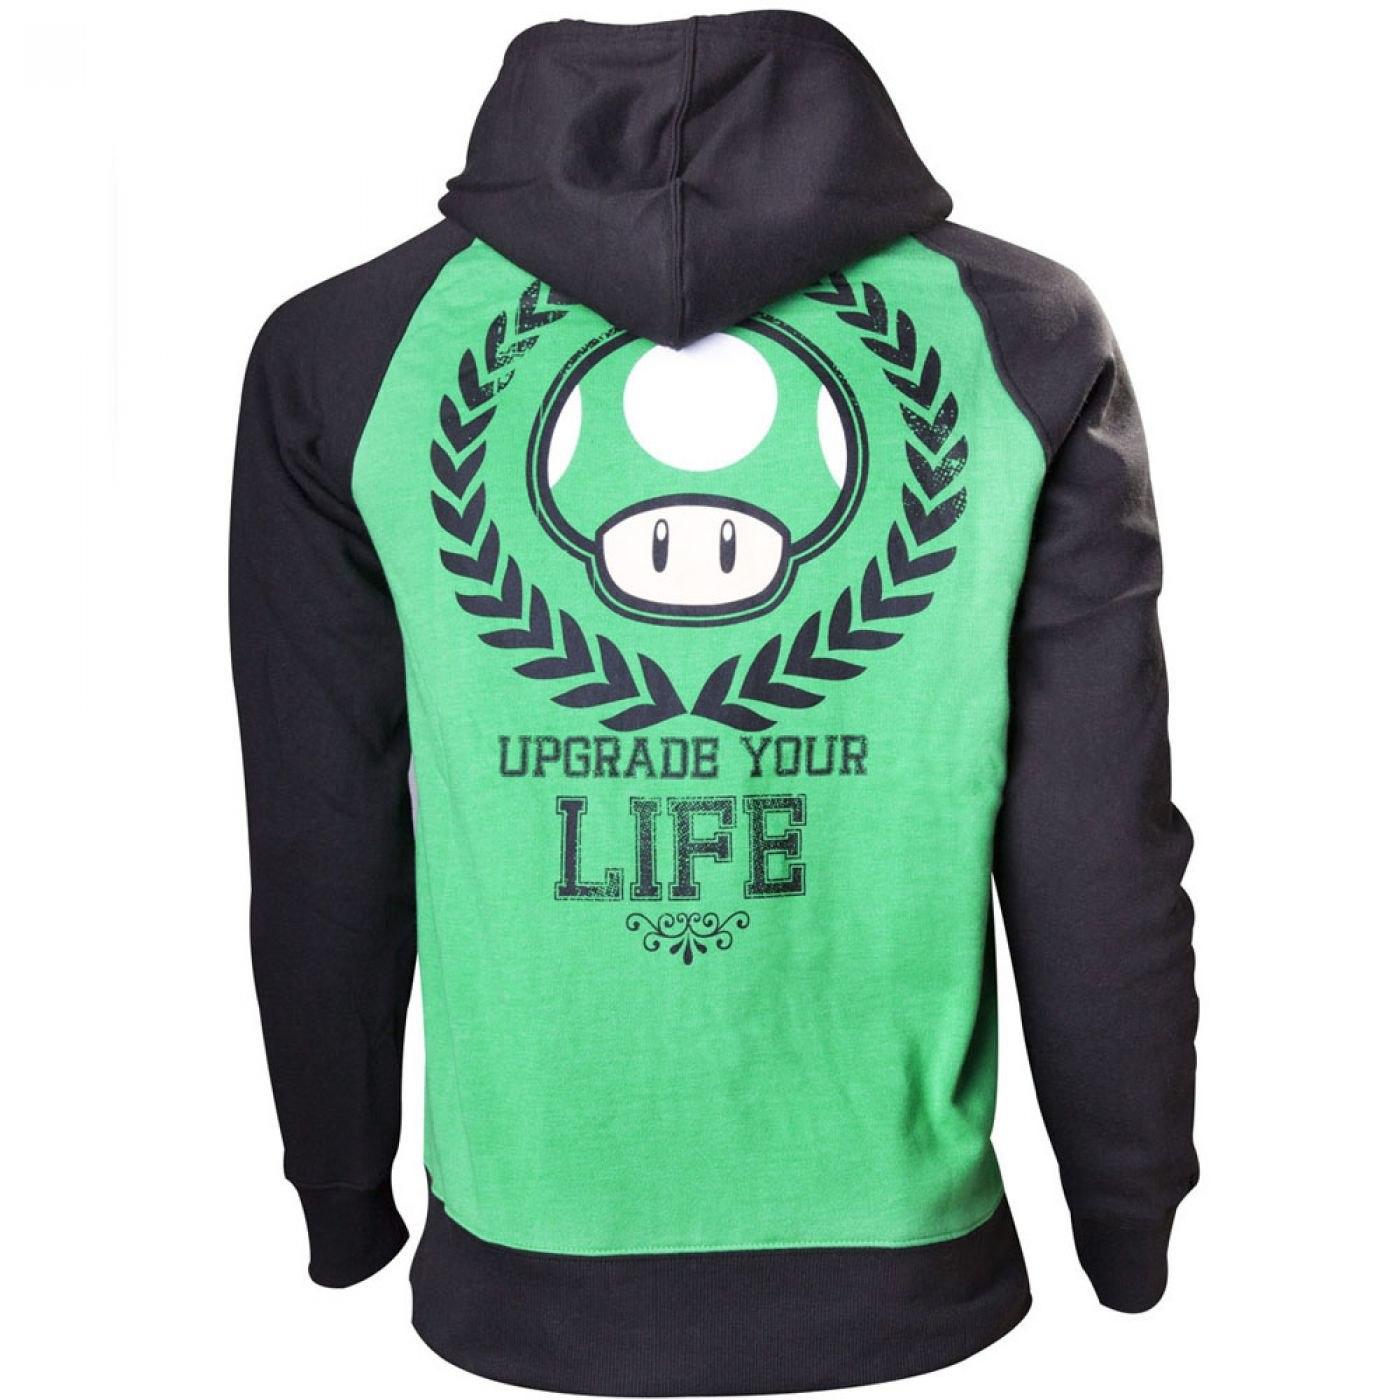 Nintendo Super Mario Bros hoodie - Upgrade Your Life 1UP hoody